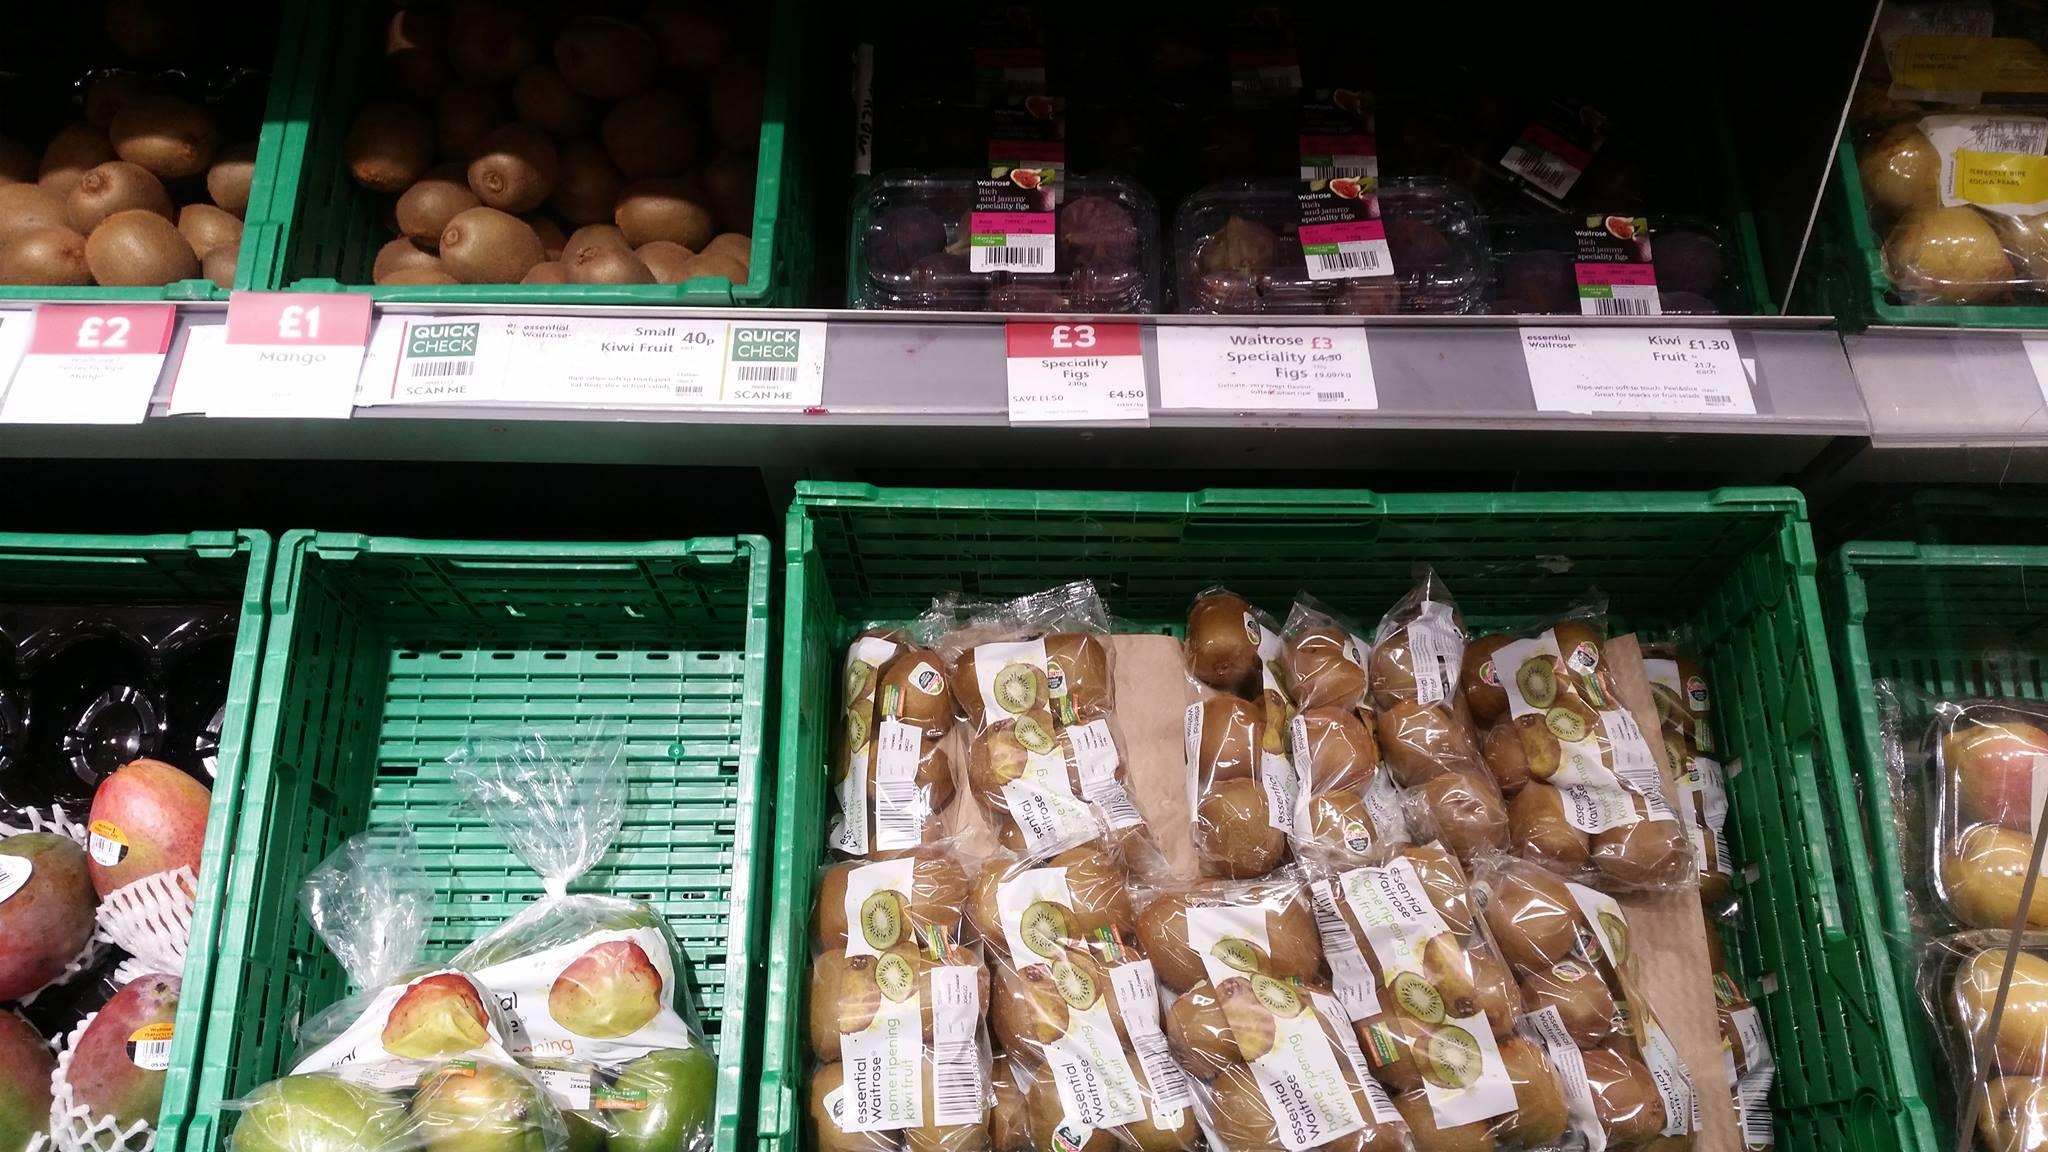 food packaging, bogof, supermarkets, packaging, plastic, zero waste, single use plastic